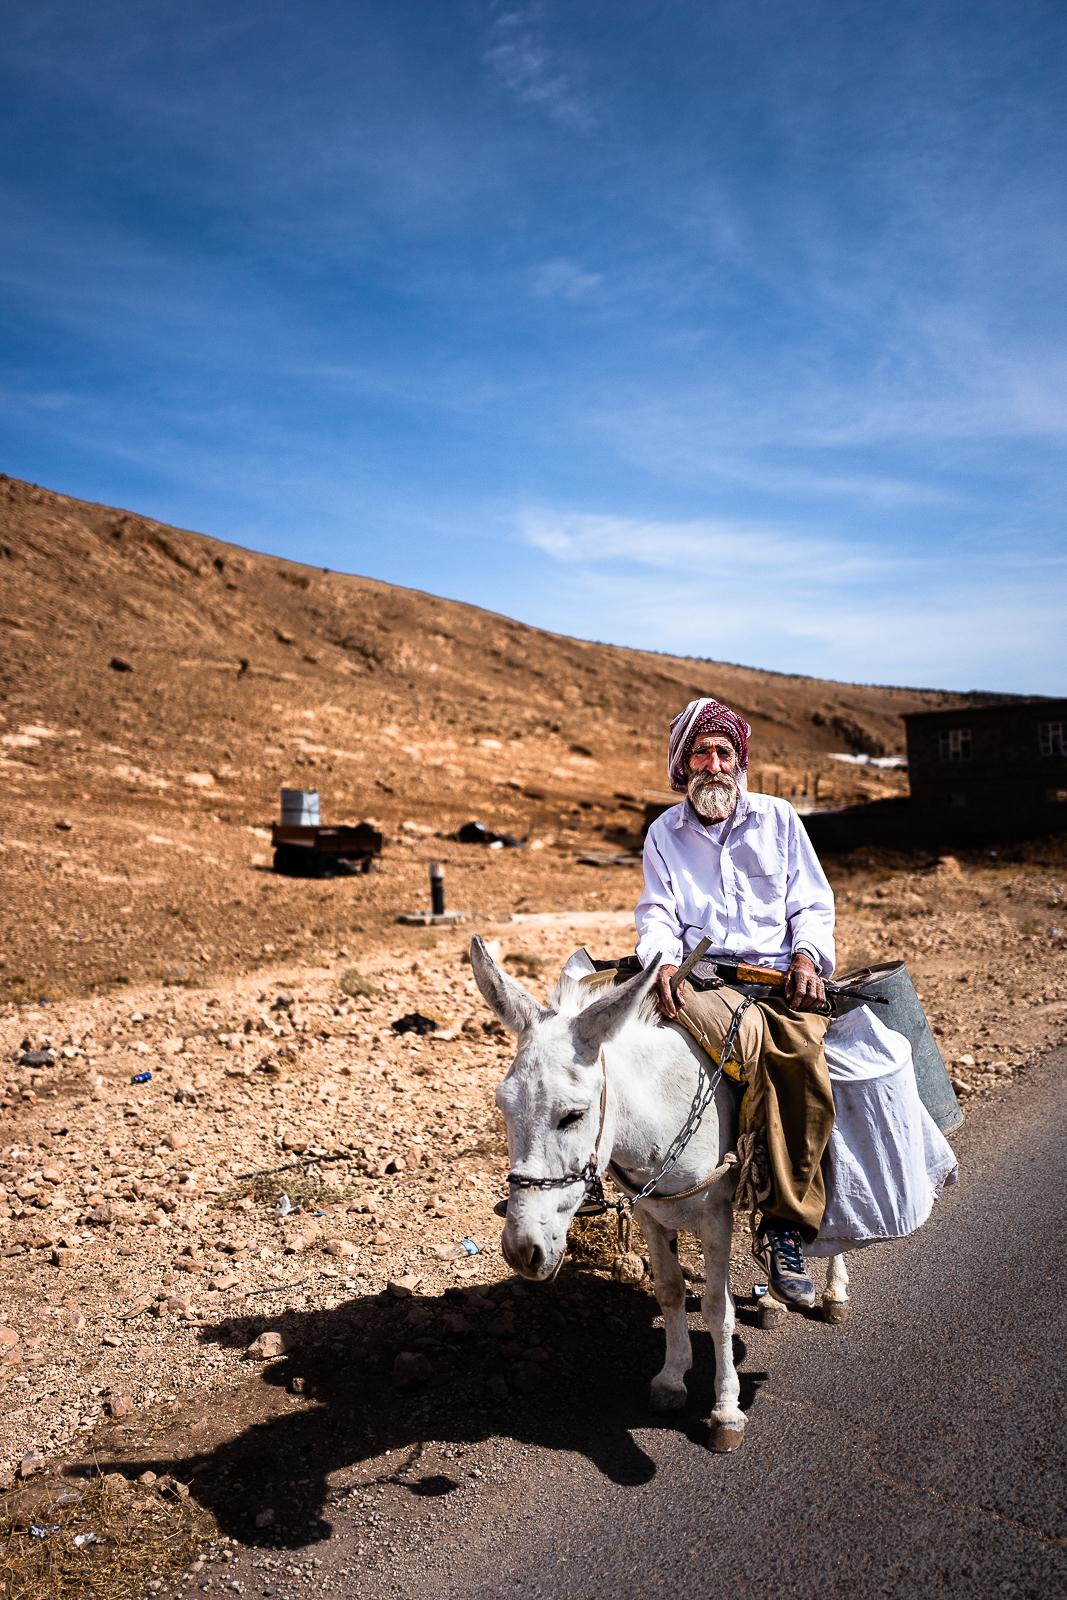 An old man with a Kalashnikov on his donkey. Sinjar mount